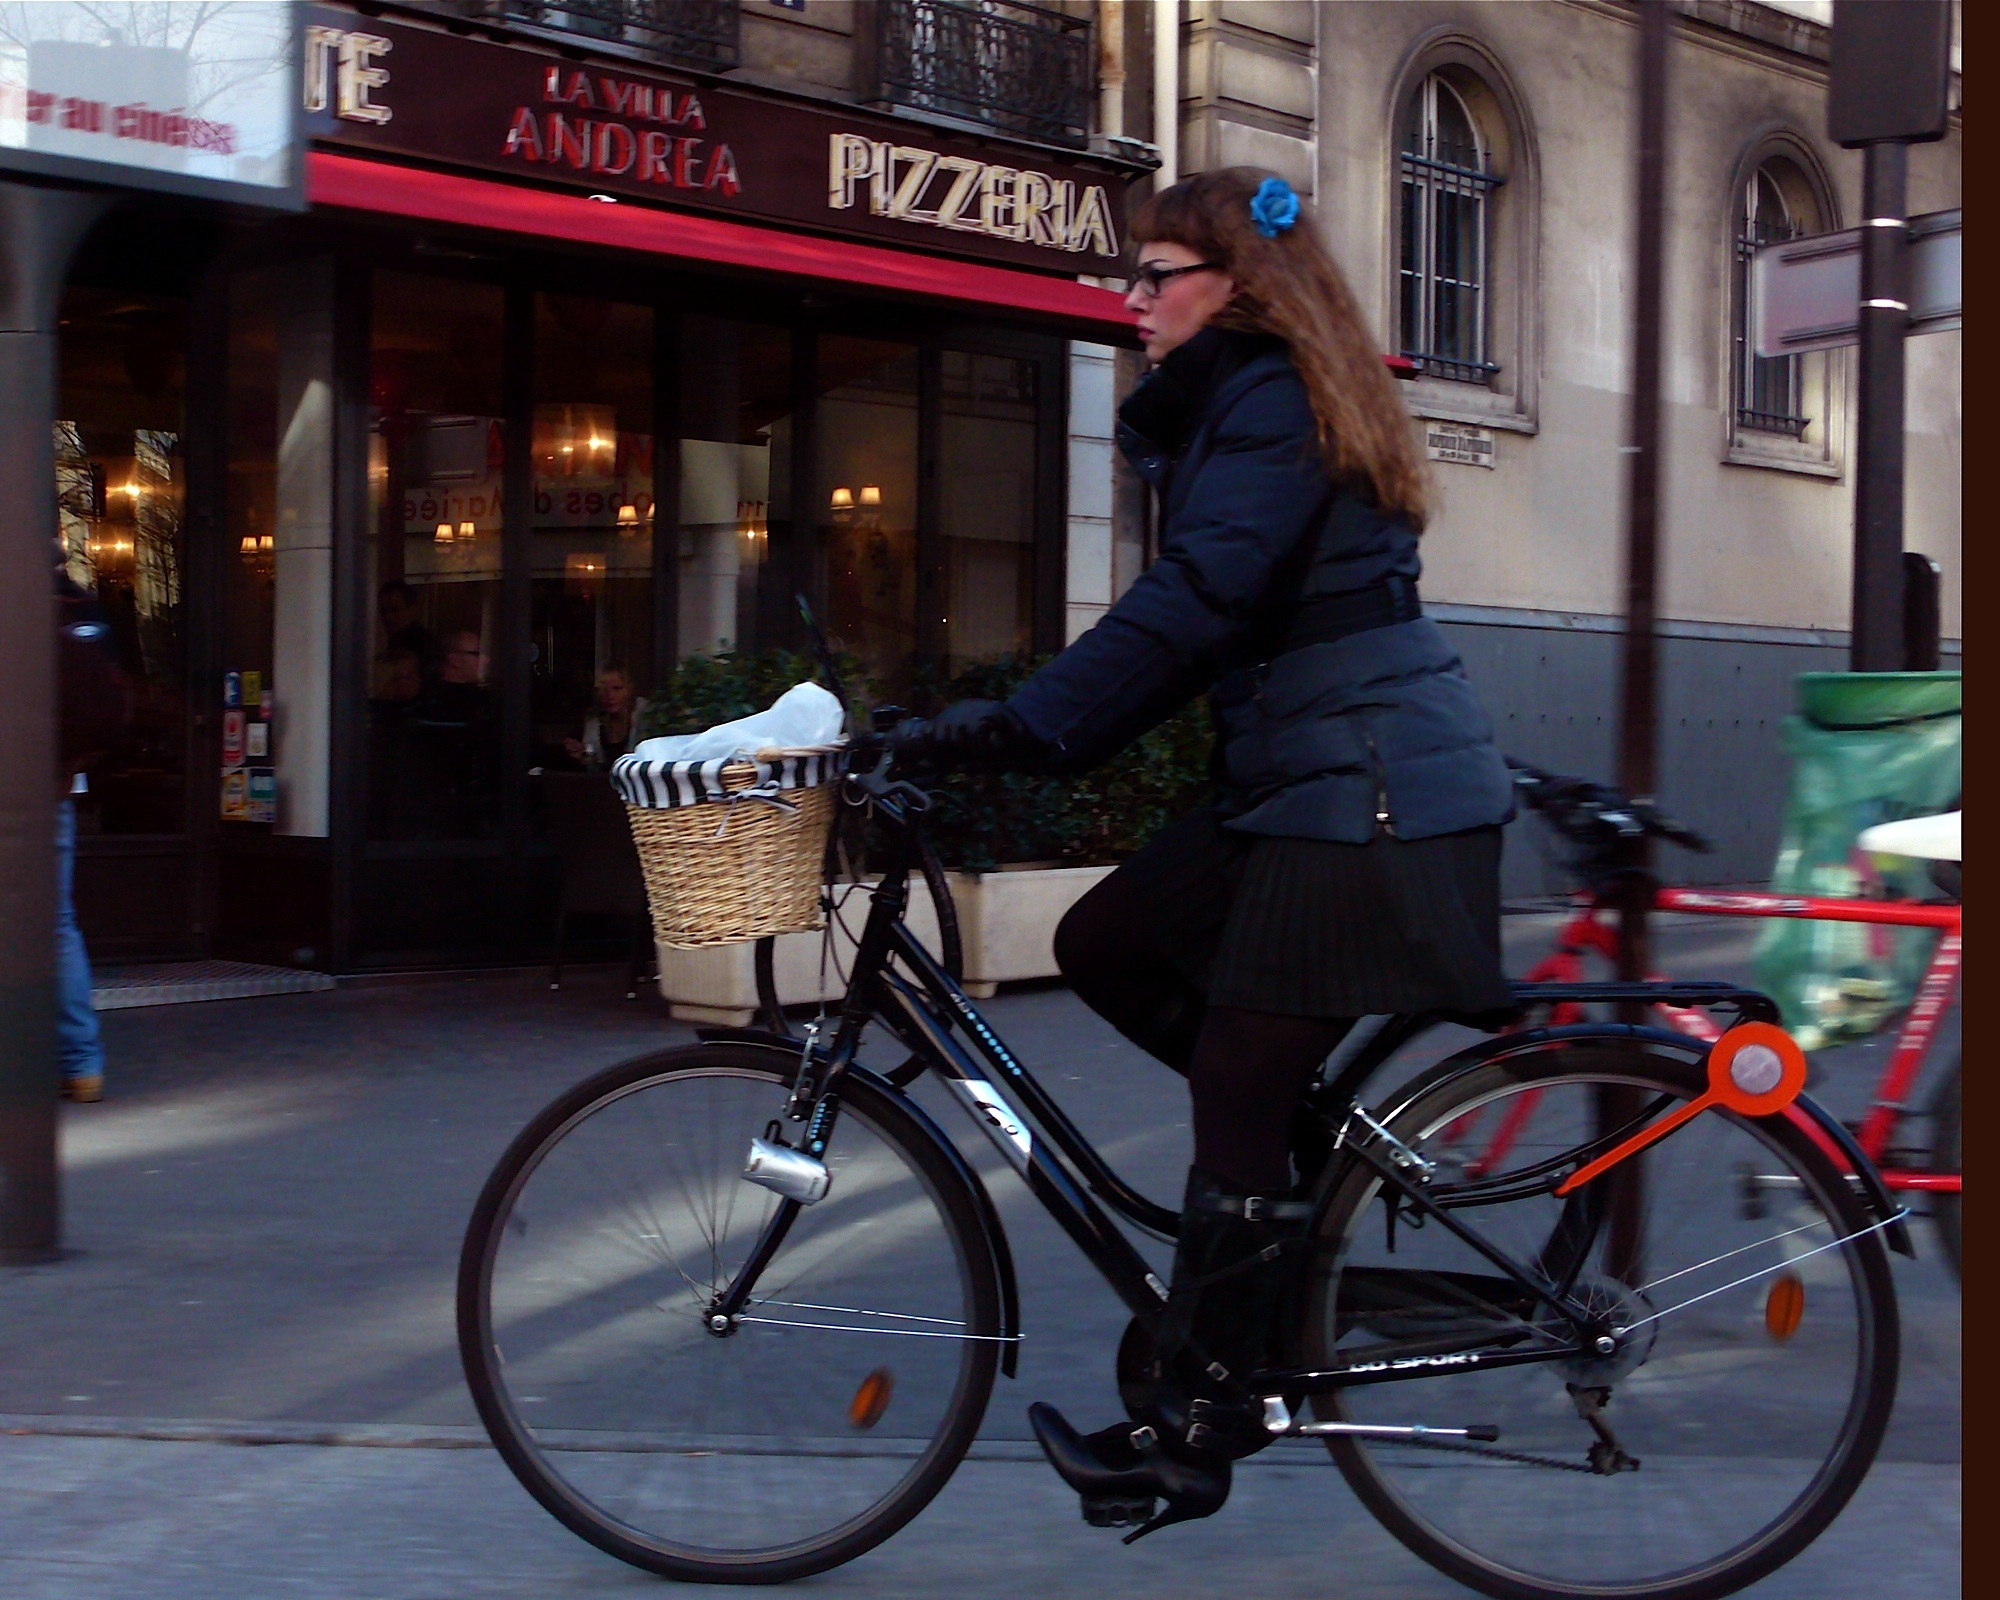 paris-bike-16x20-P1110397.jpg